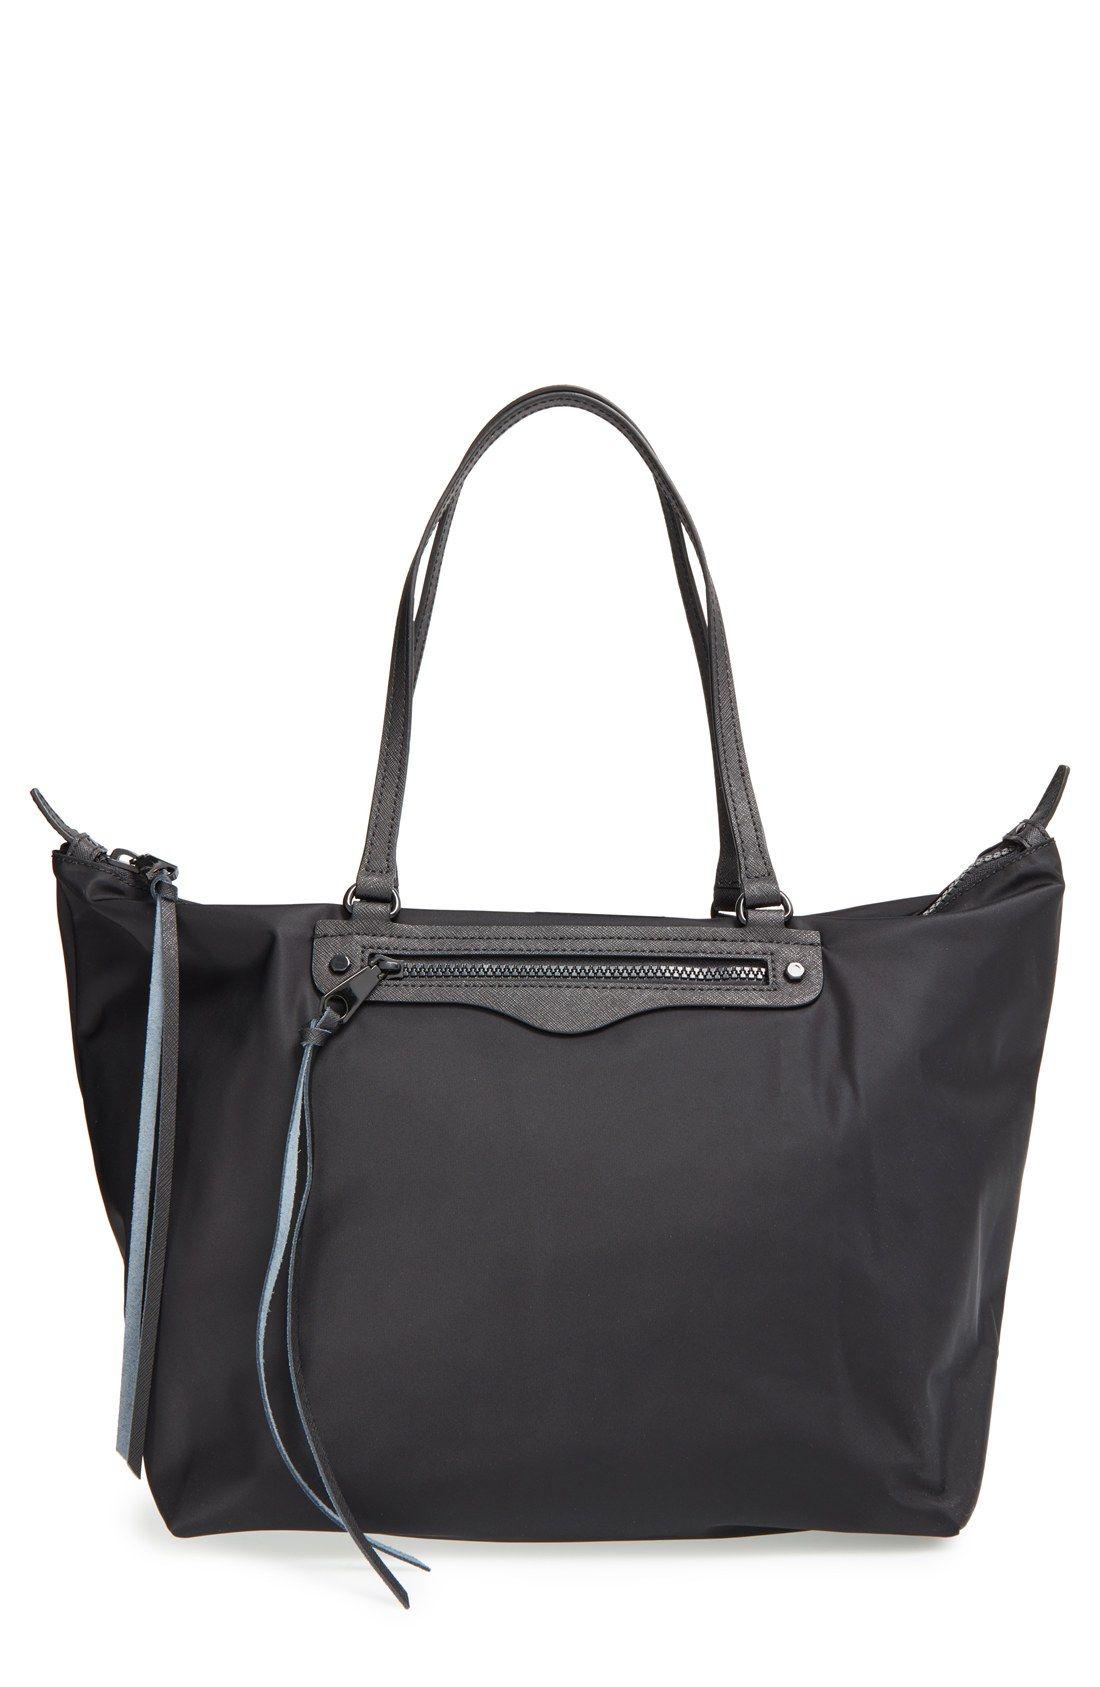 6d05d1f9f45 Rebecca Minkoff 'EZ Zip' Tote   bags   Nylon tote, Bag accessories, Bags